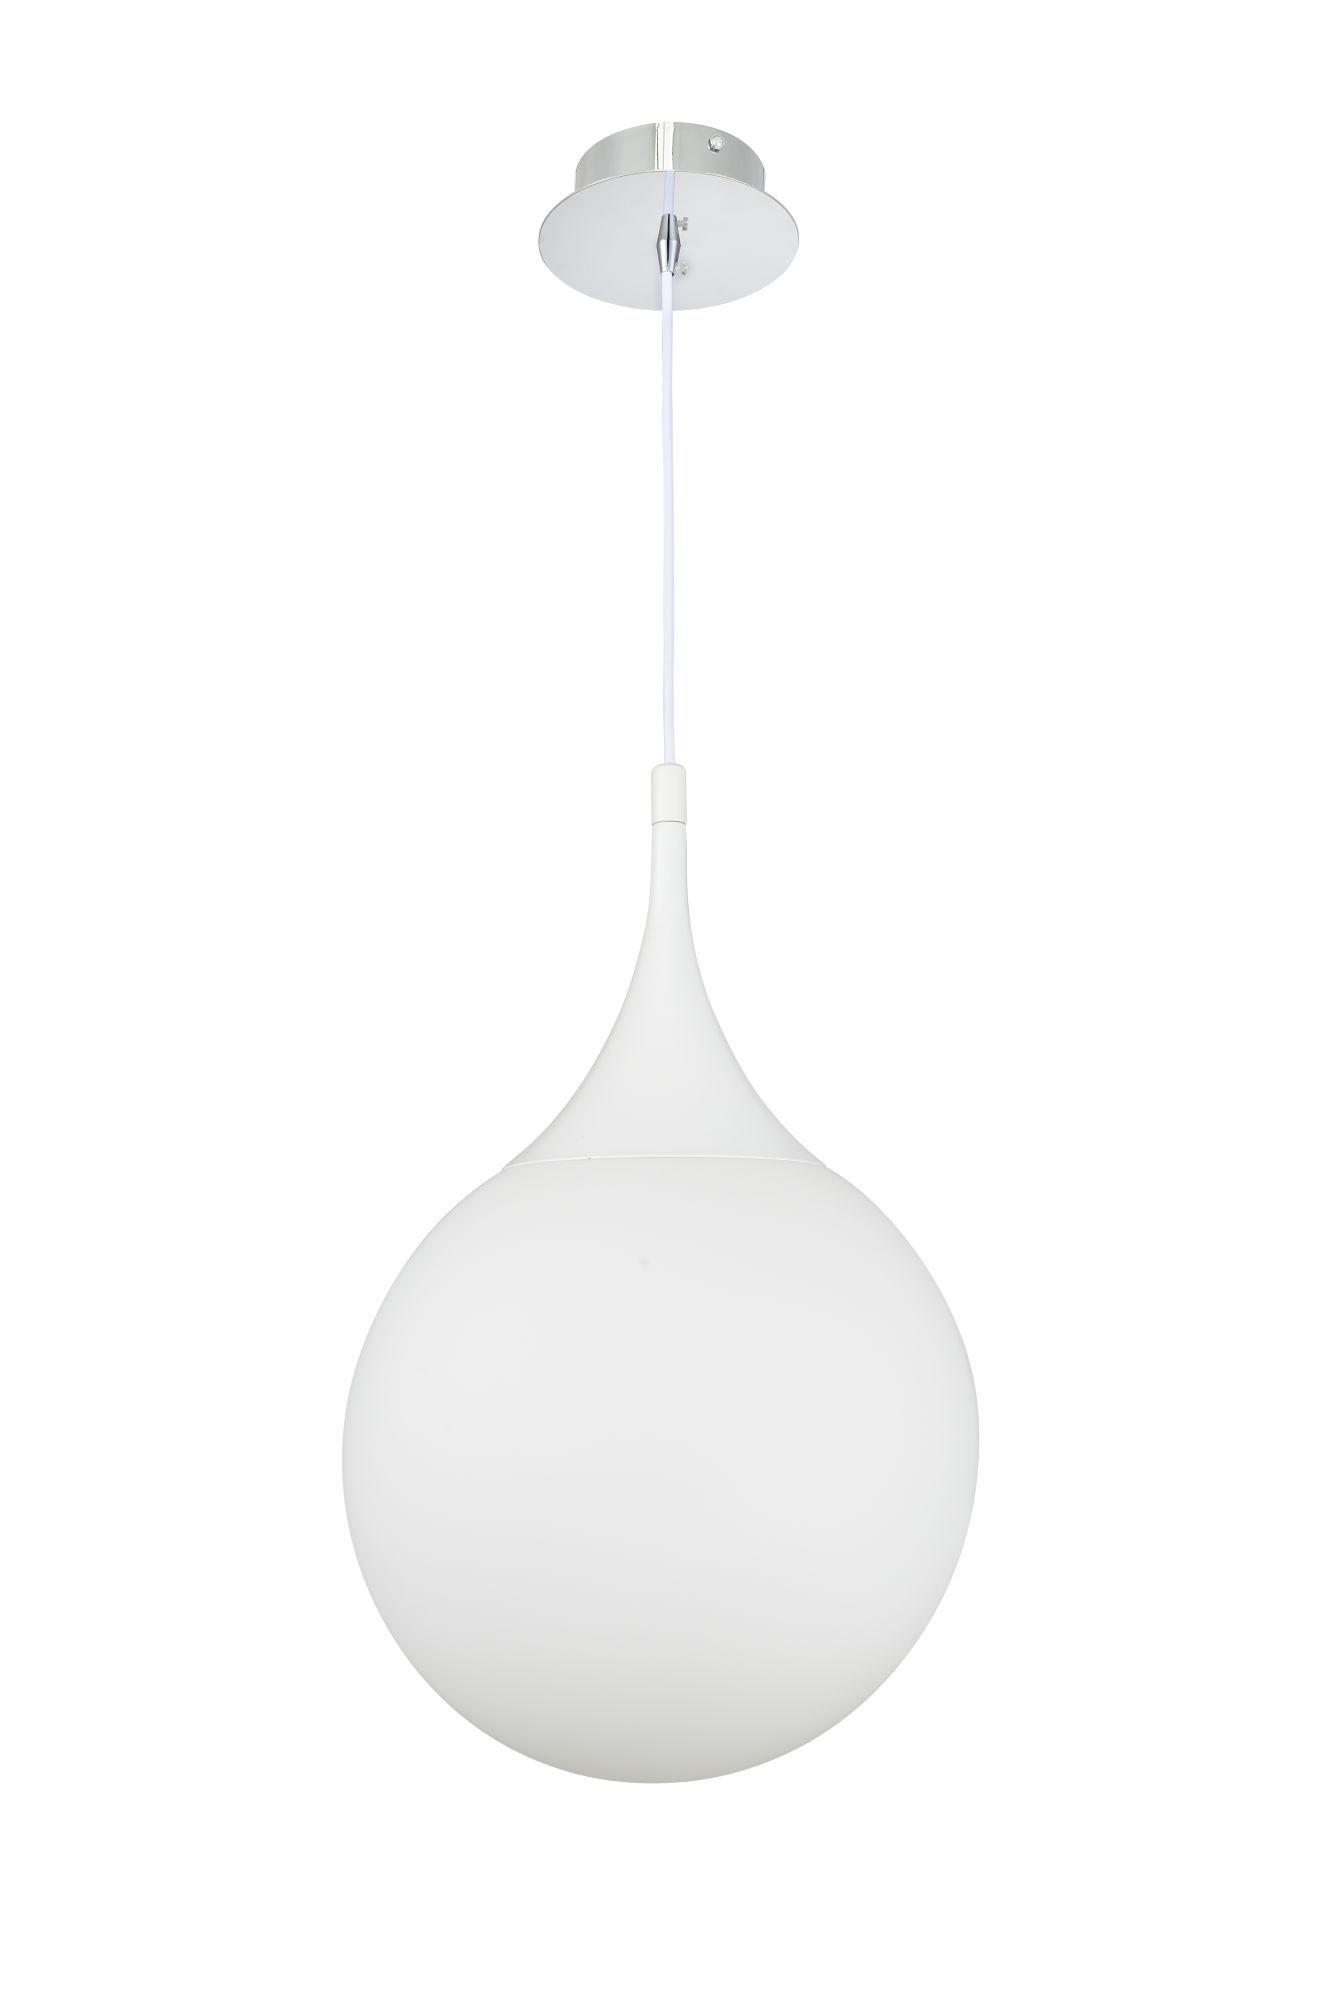 Подвесной светильник Maytoni Modern Dewdrop P225-PL-300-N (MOD225-30-N), 1xE27x8W, белый, металл, стекло - фото 3